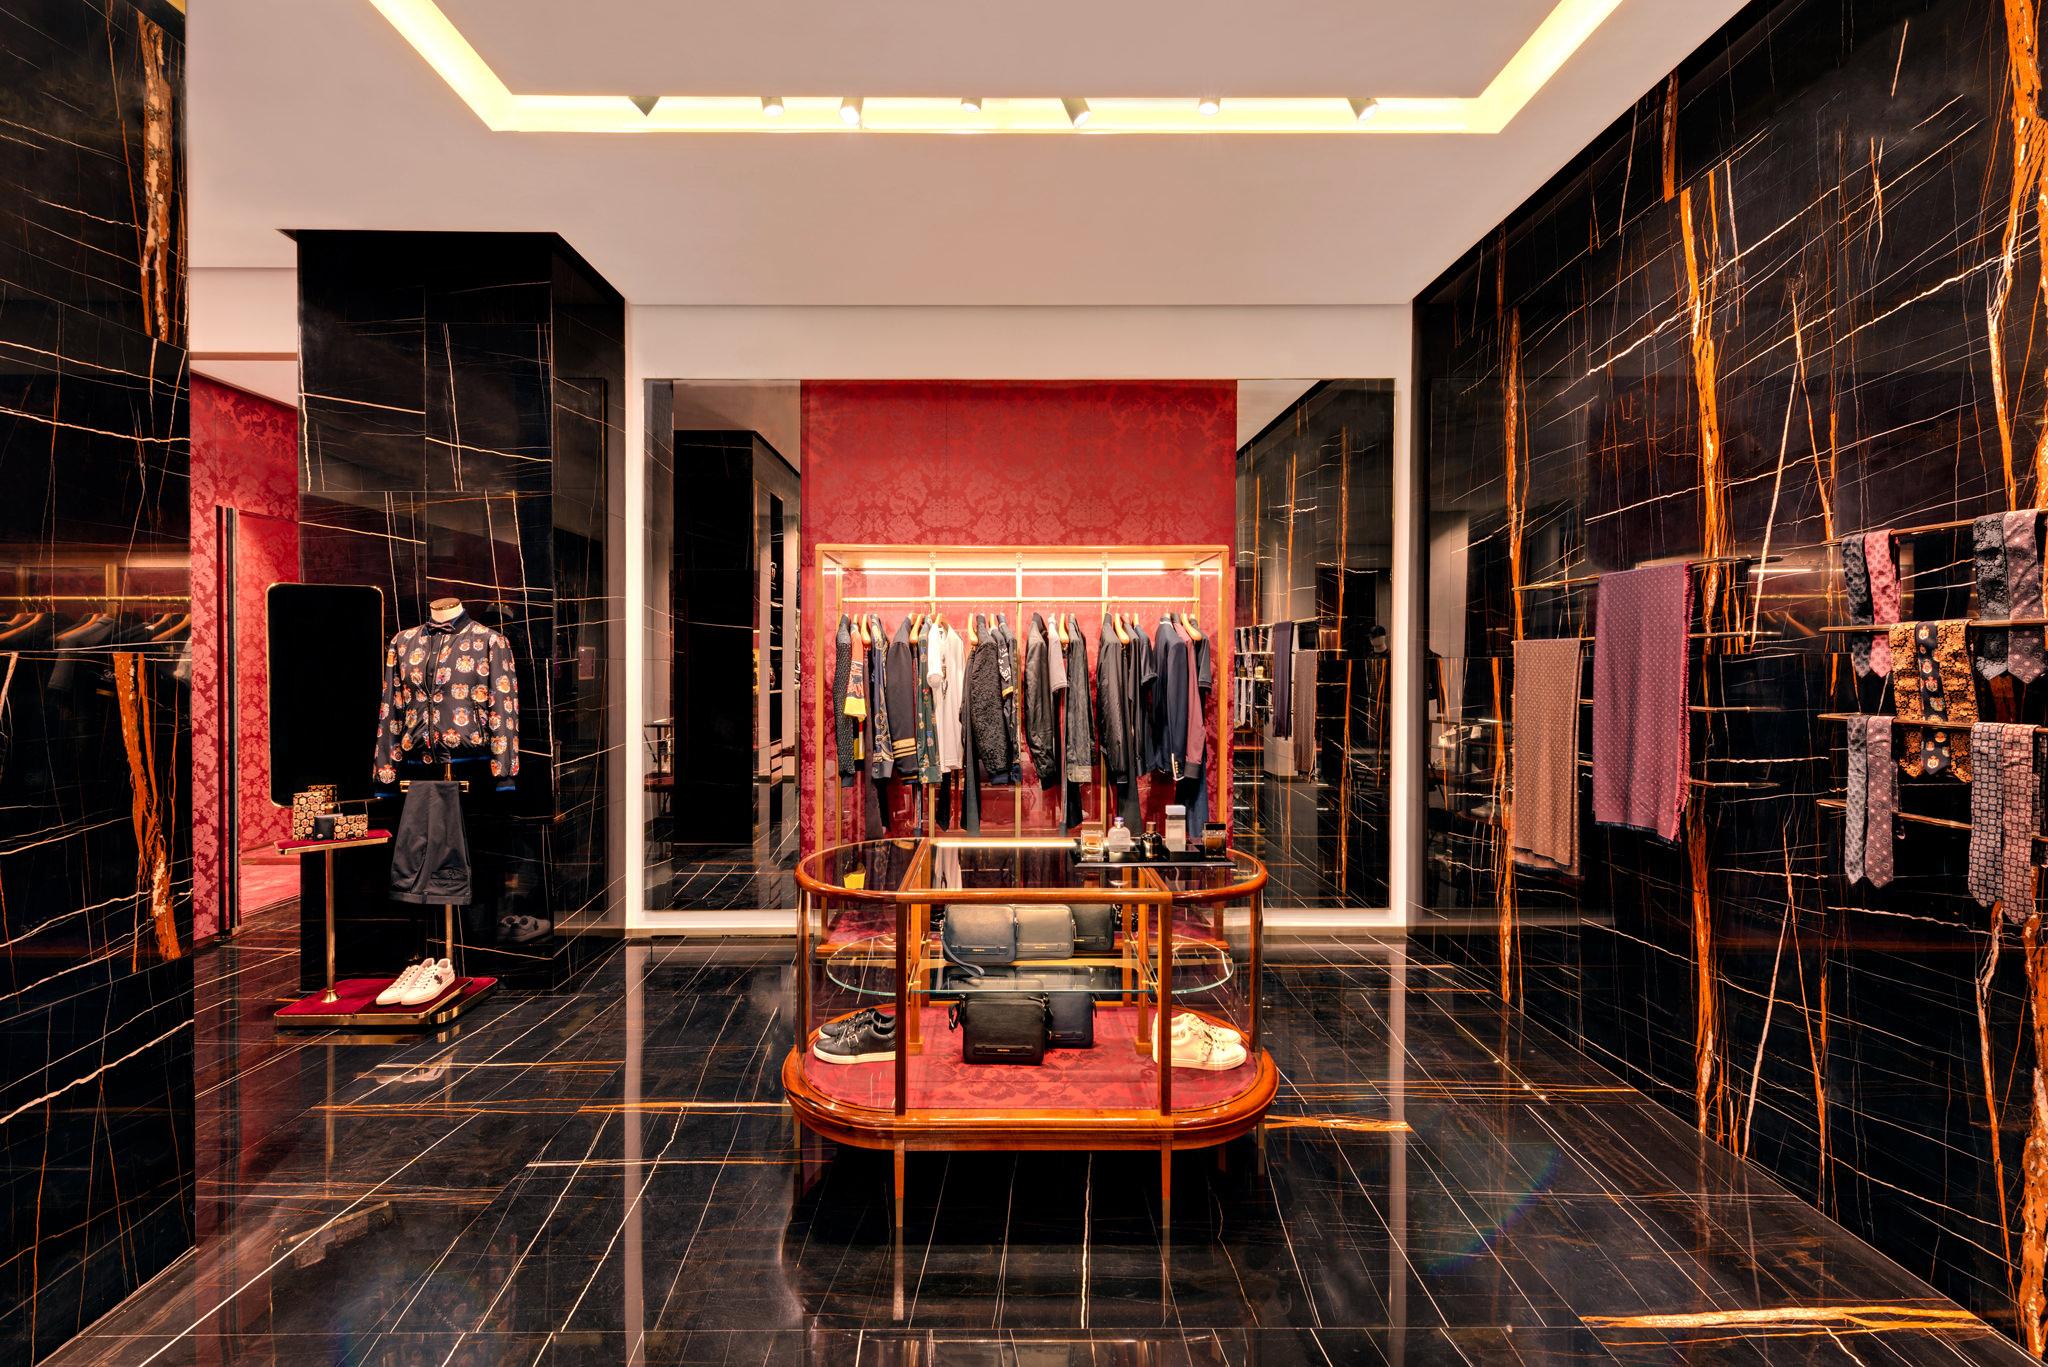 20171011 - Dolce & Gabbana - HCM - Commercial - Interior - Store - Retouch 0046.jpg